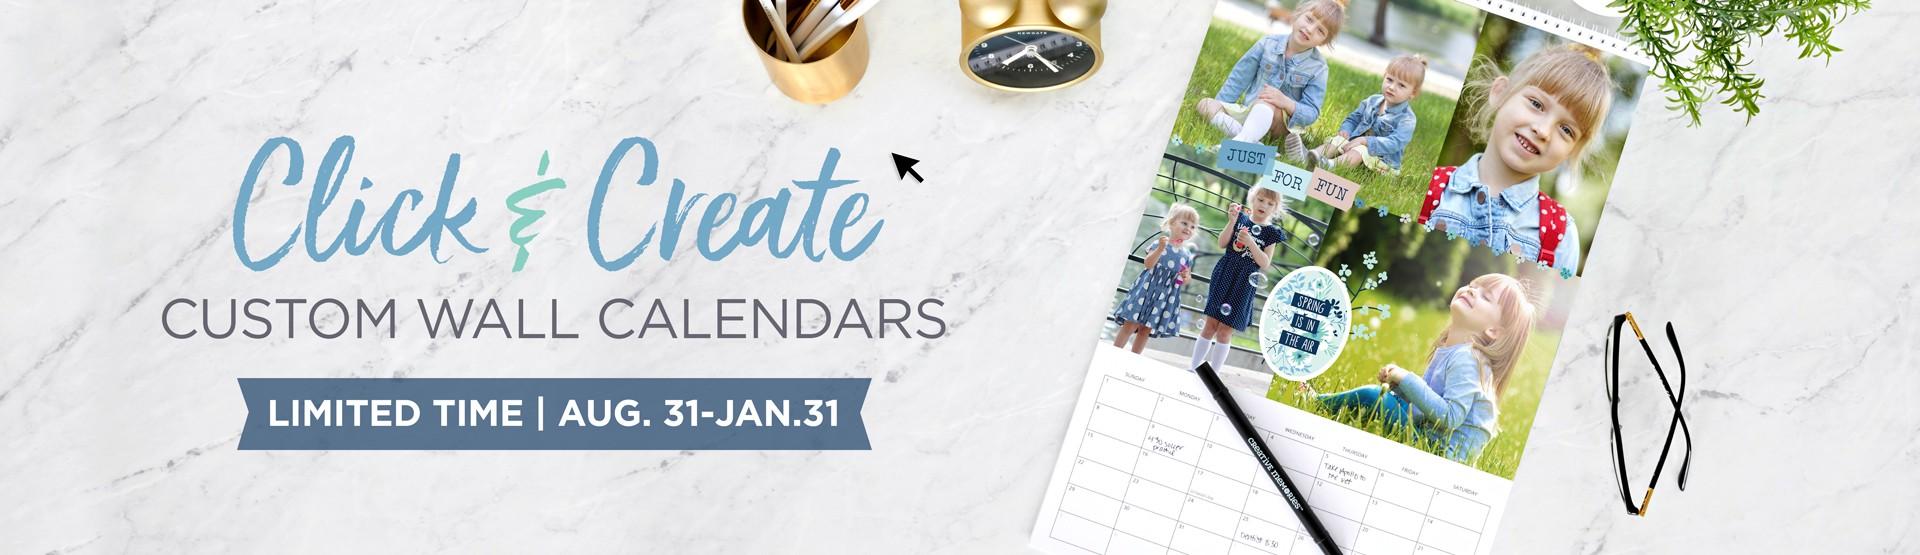 LIMITED TIME: Custom Wall Calendars